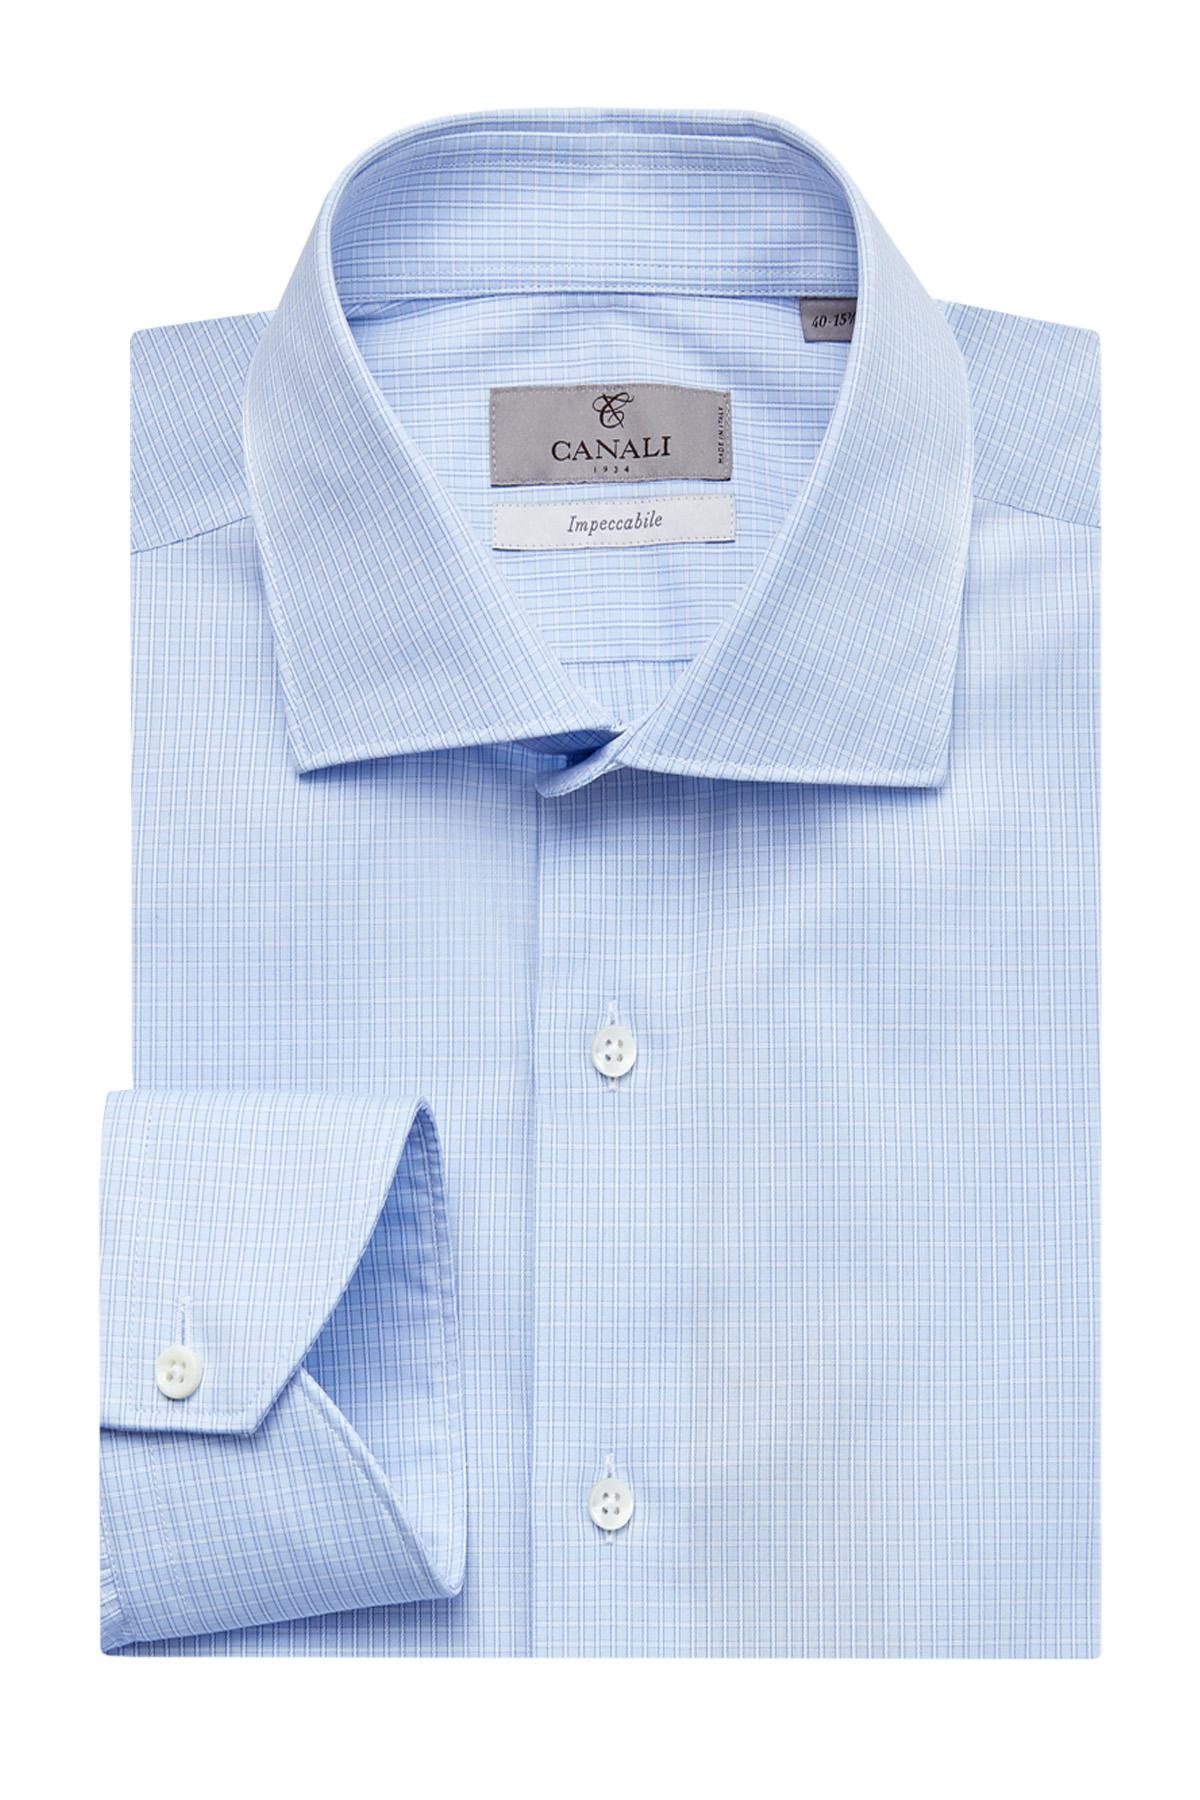 Рубашка с принтом в клетку из хлопка Impeccabile